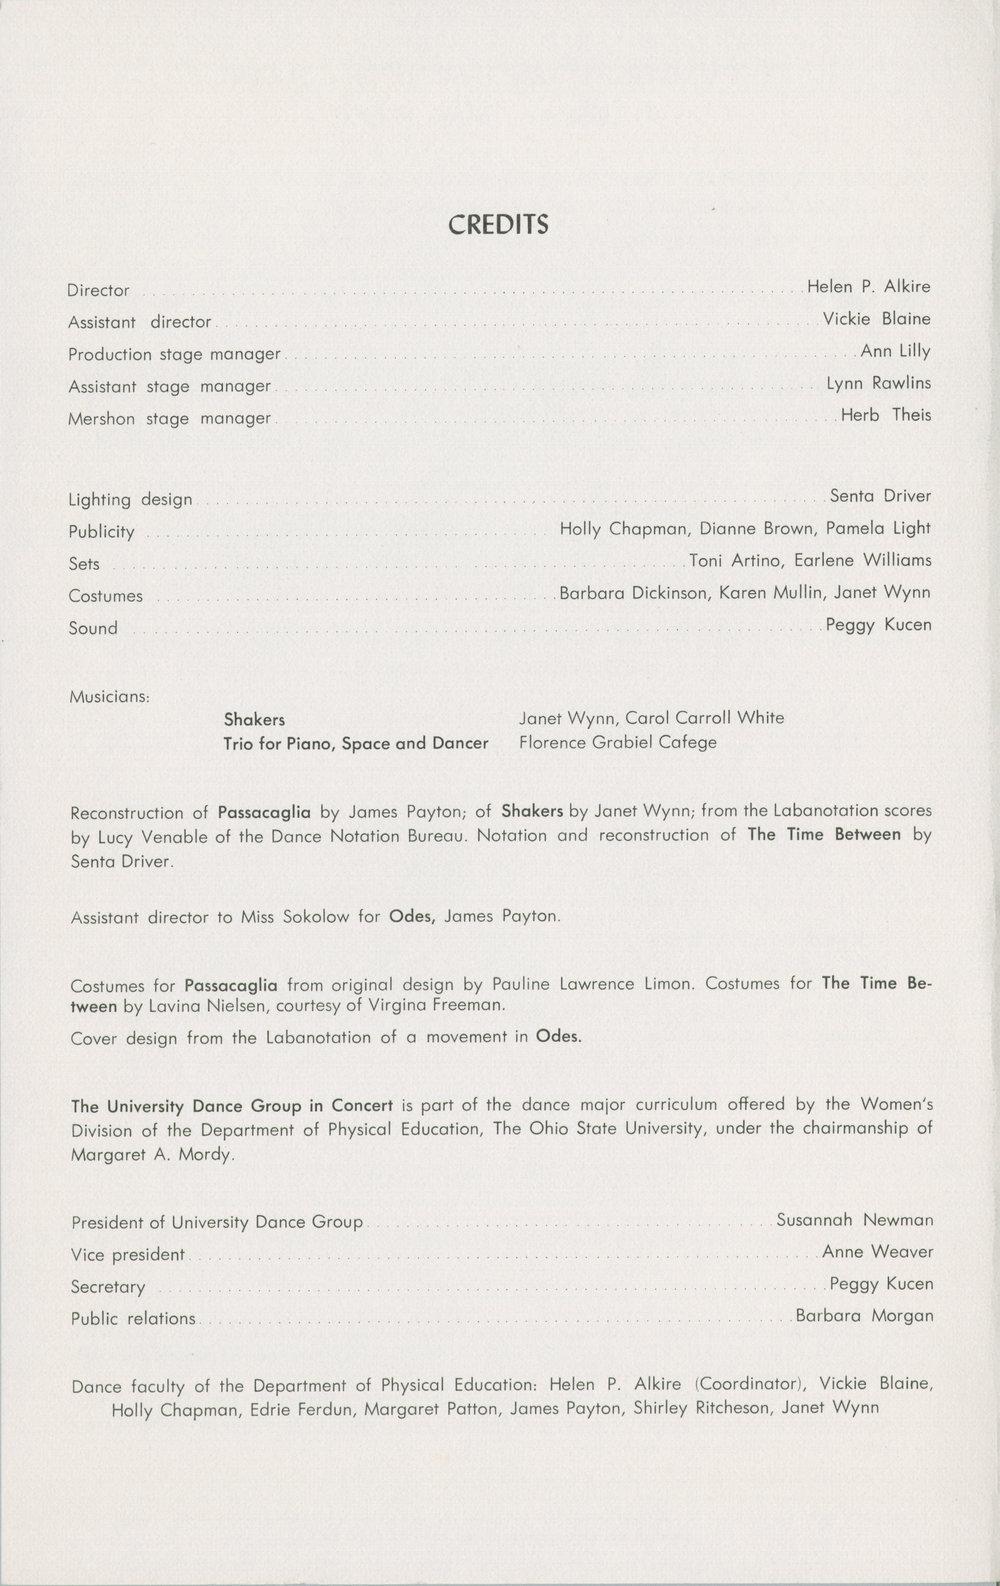 UDG_1966_DancePrograms-019-003.jpg